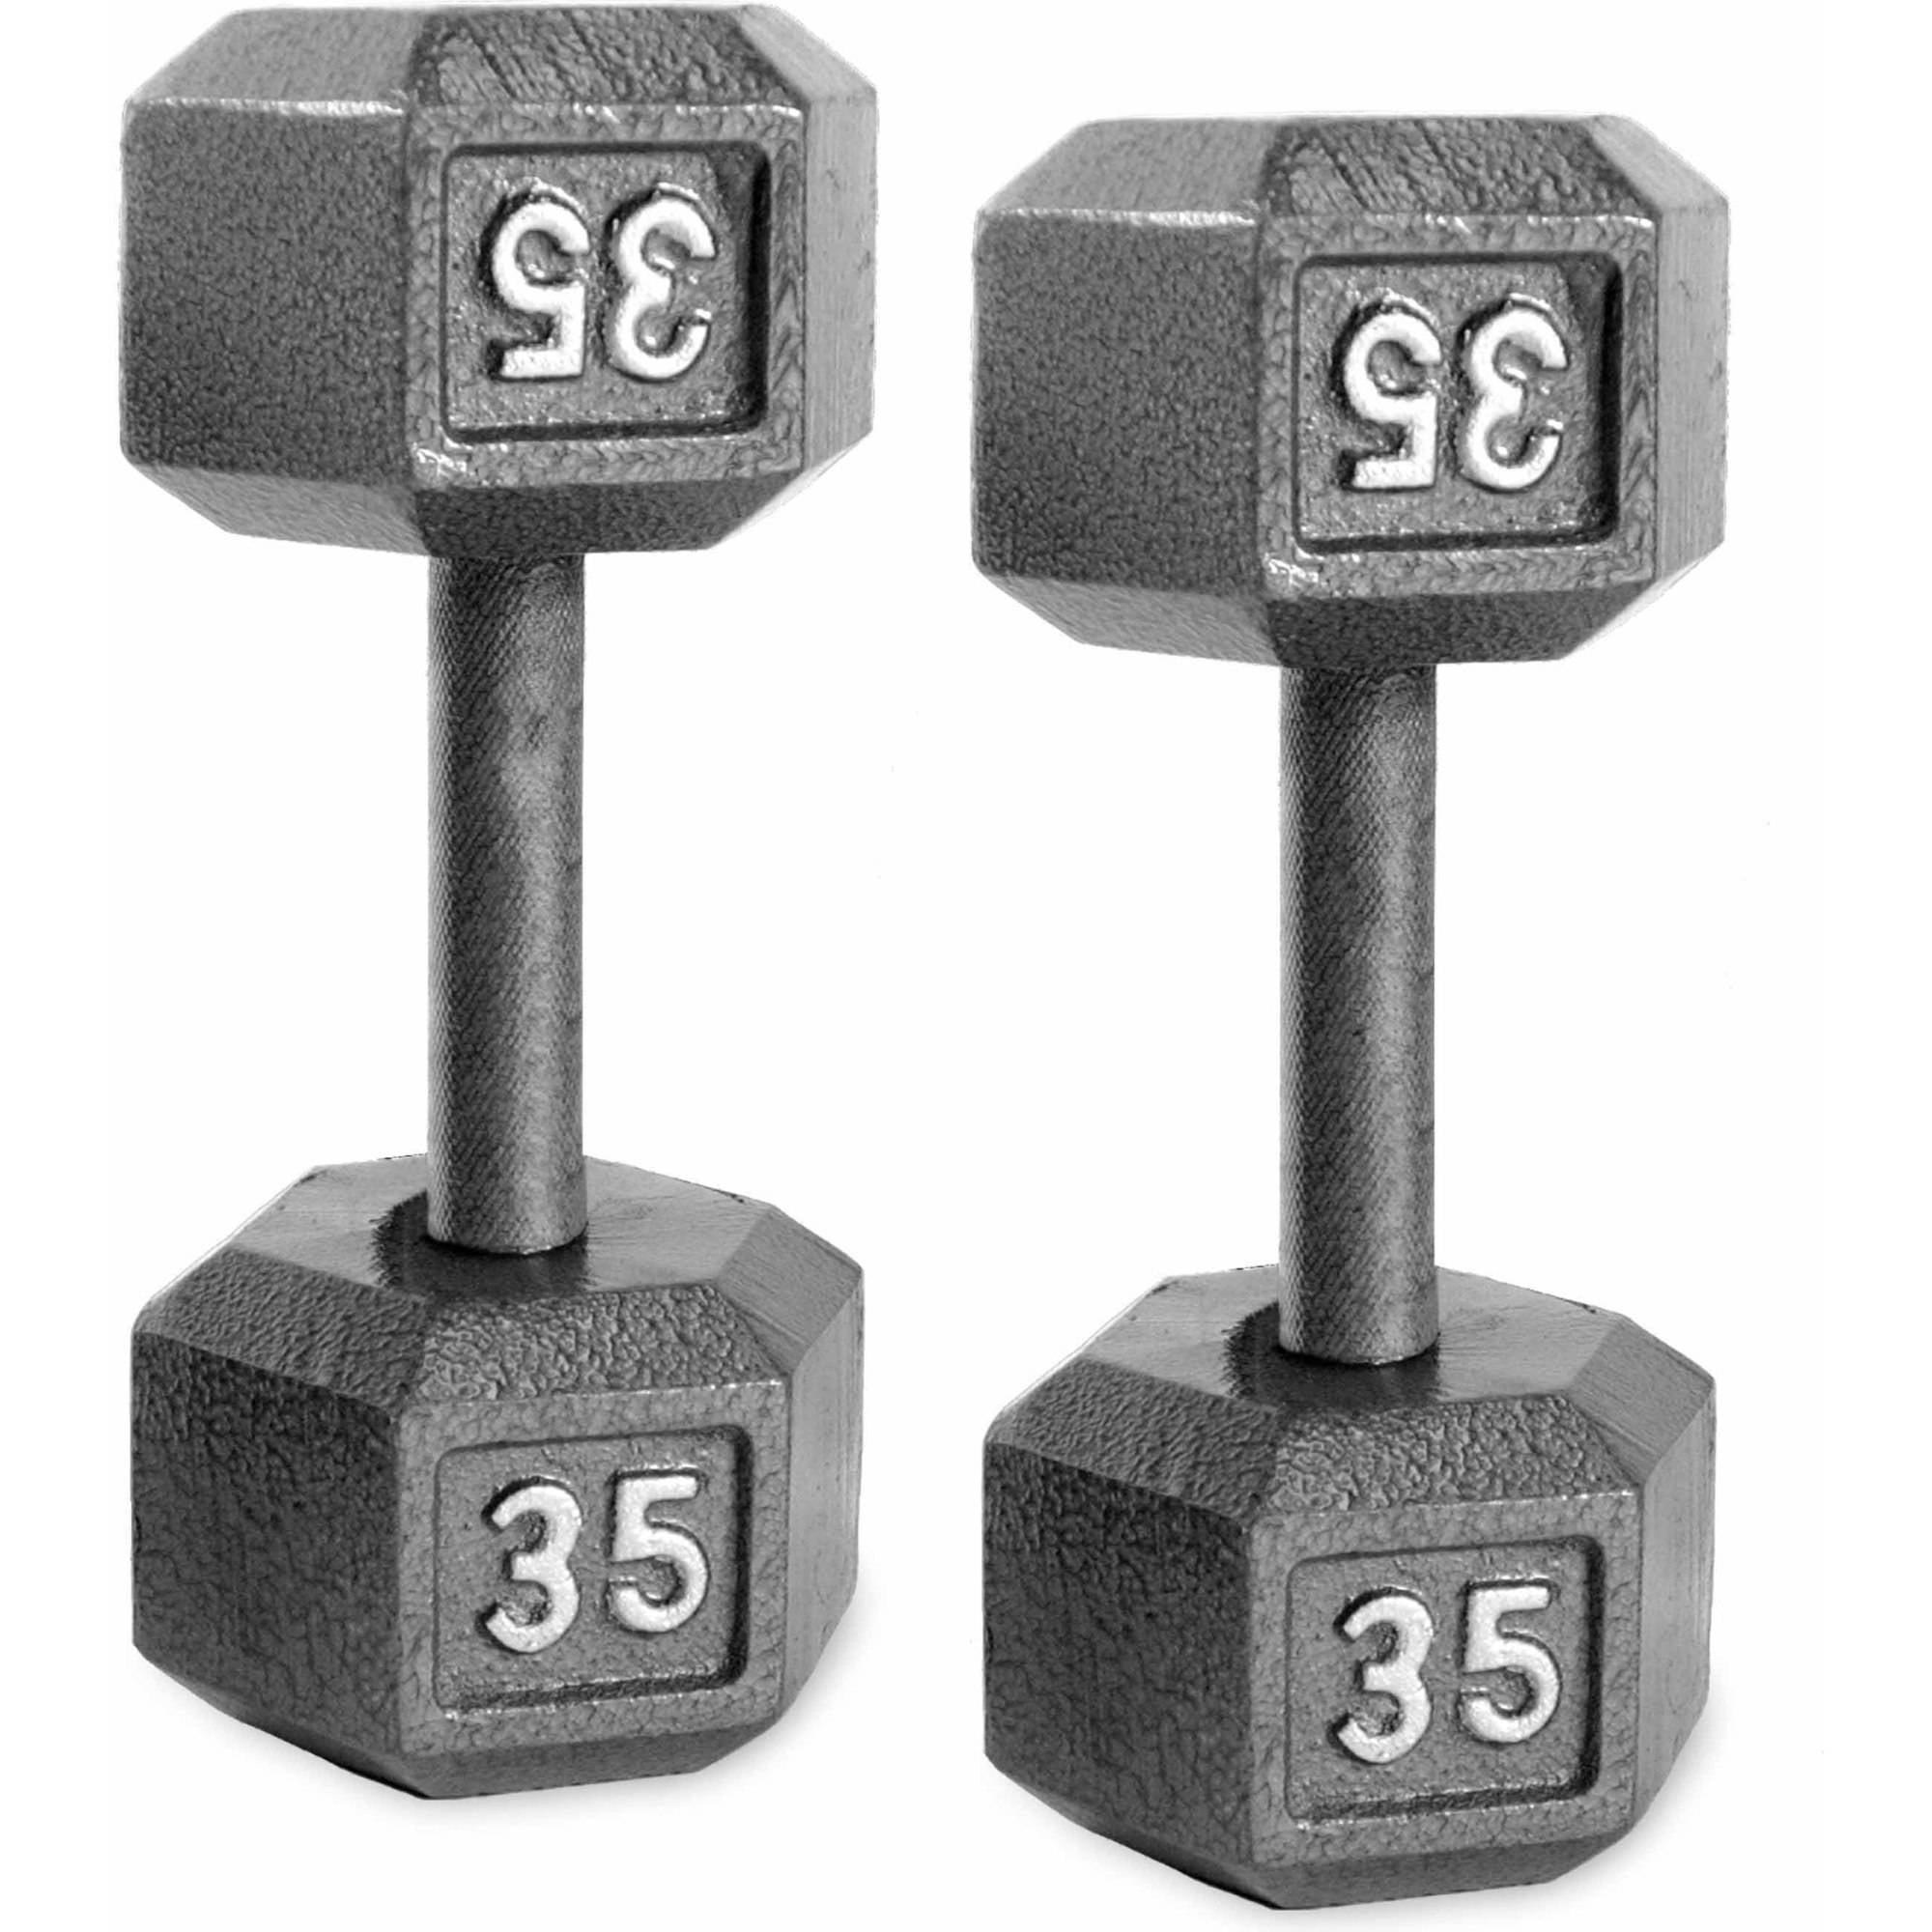 10 lb total Pair of 5 lb Cast Iron Hexagon Vintage Dumbbells